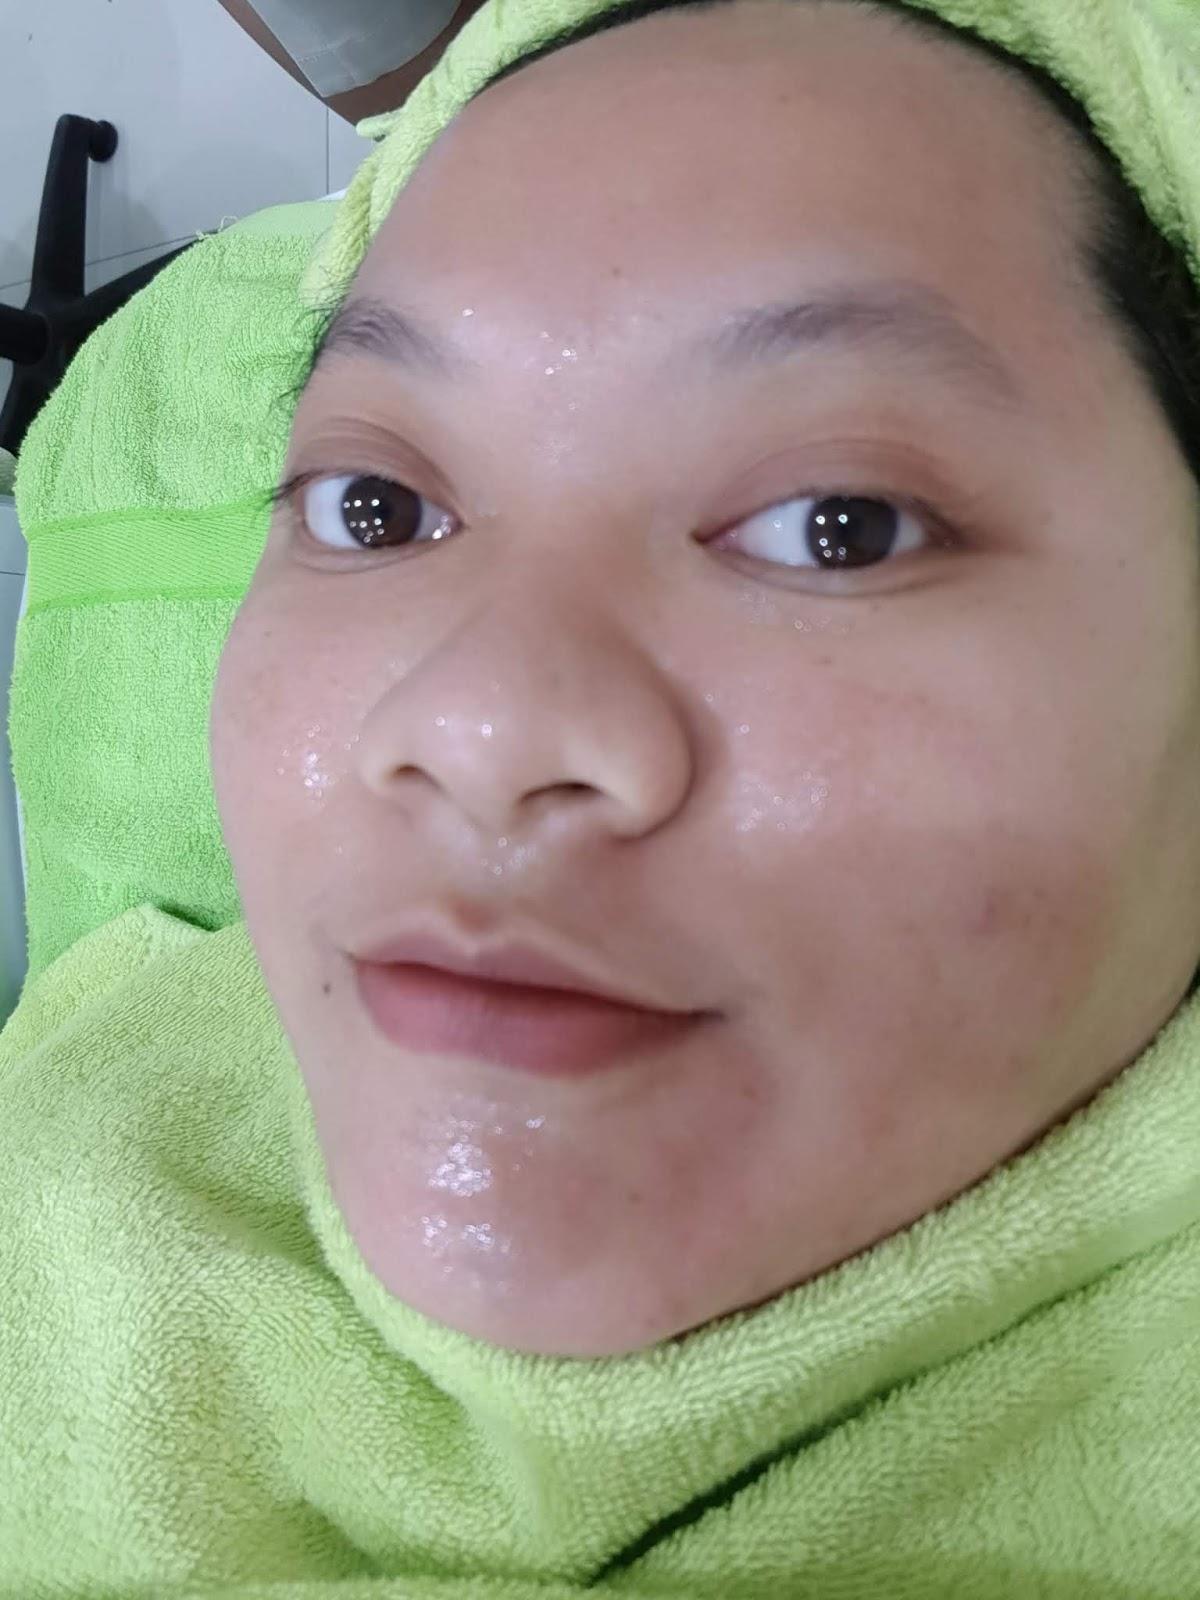 Treatment Di Naavagreen Bandung